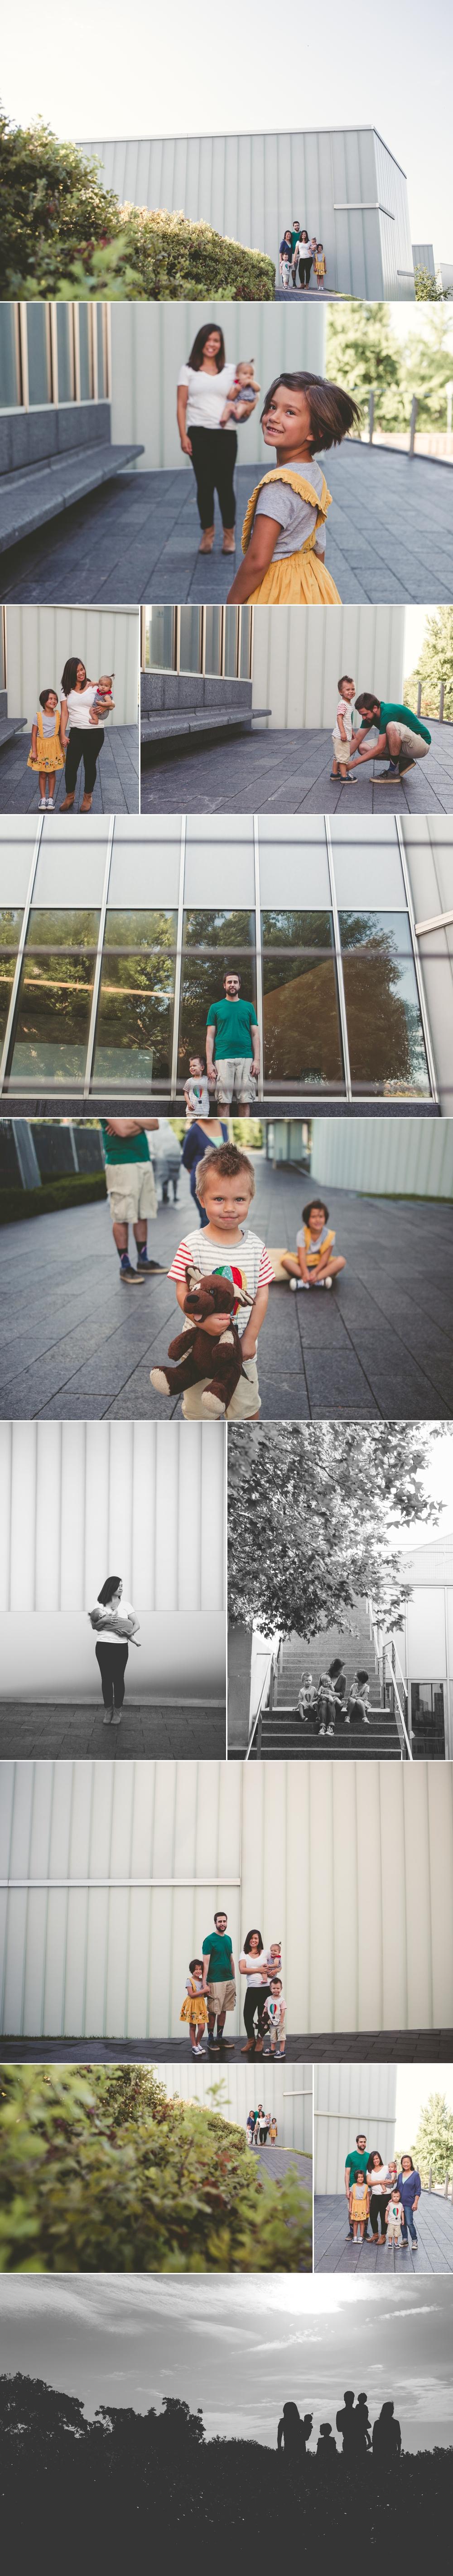 jason_domingues_photography_best_kansas_city_photographer_kc_family_session_nelson_atkins.jpg